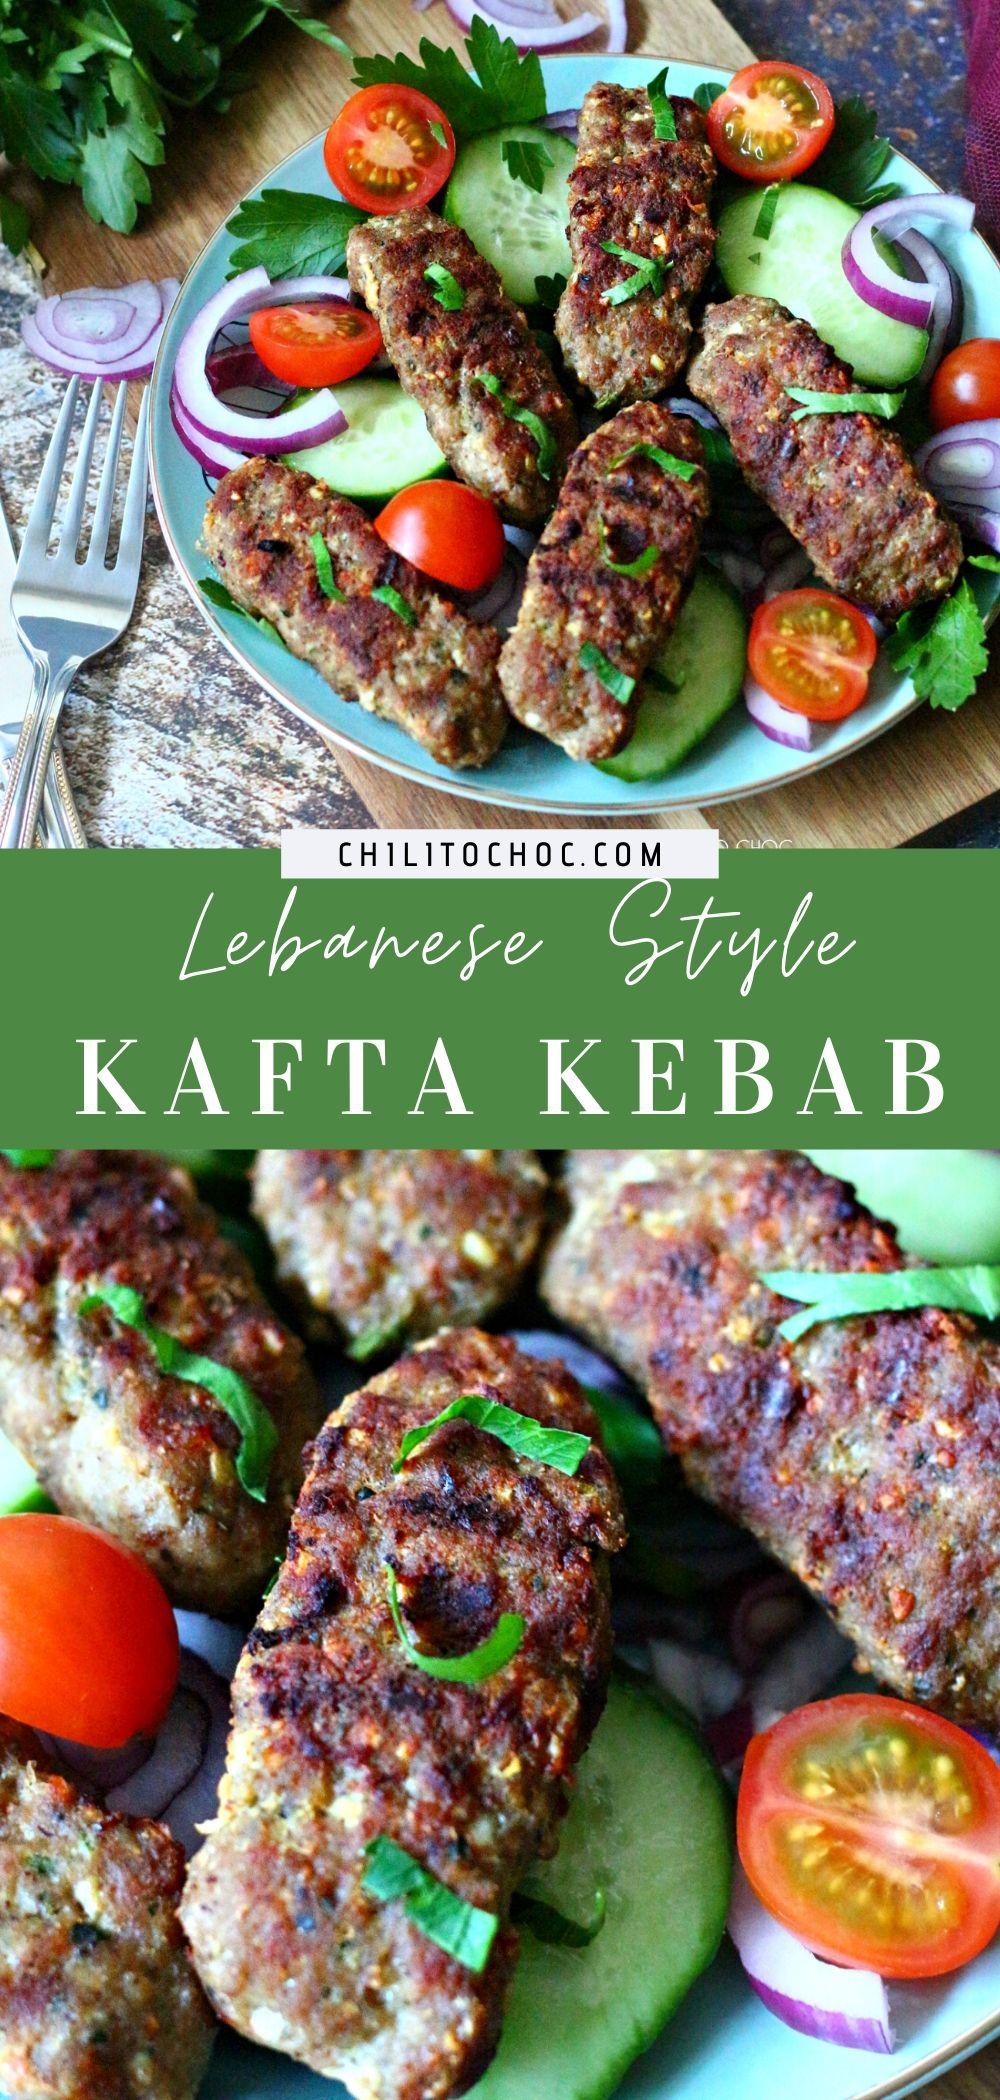 Lebanese Kafta Kebab - pinterest